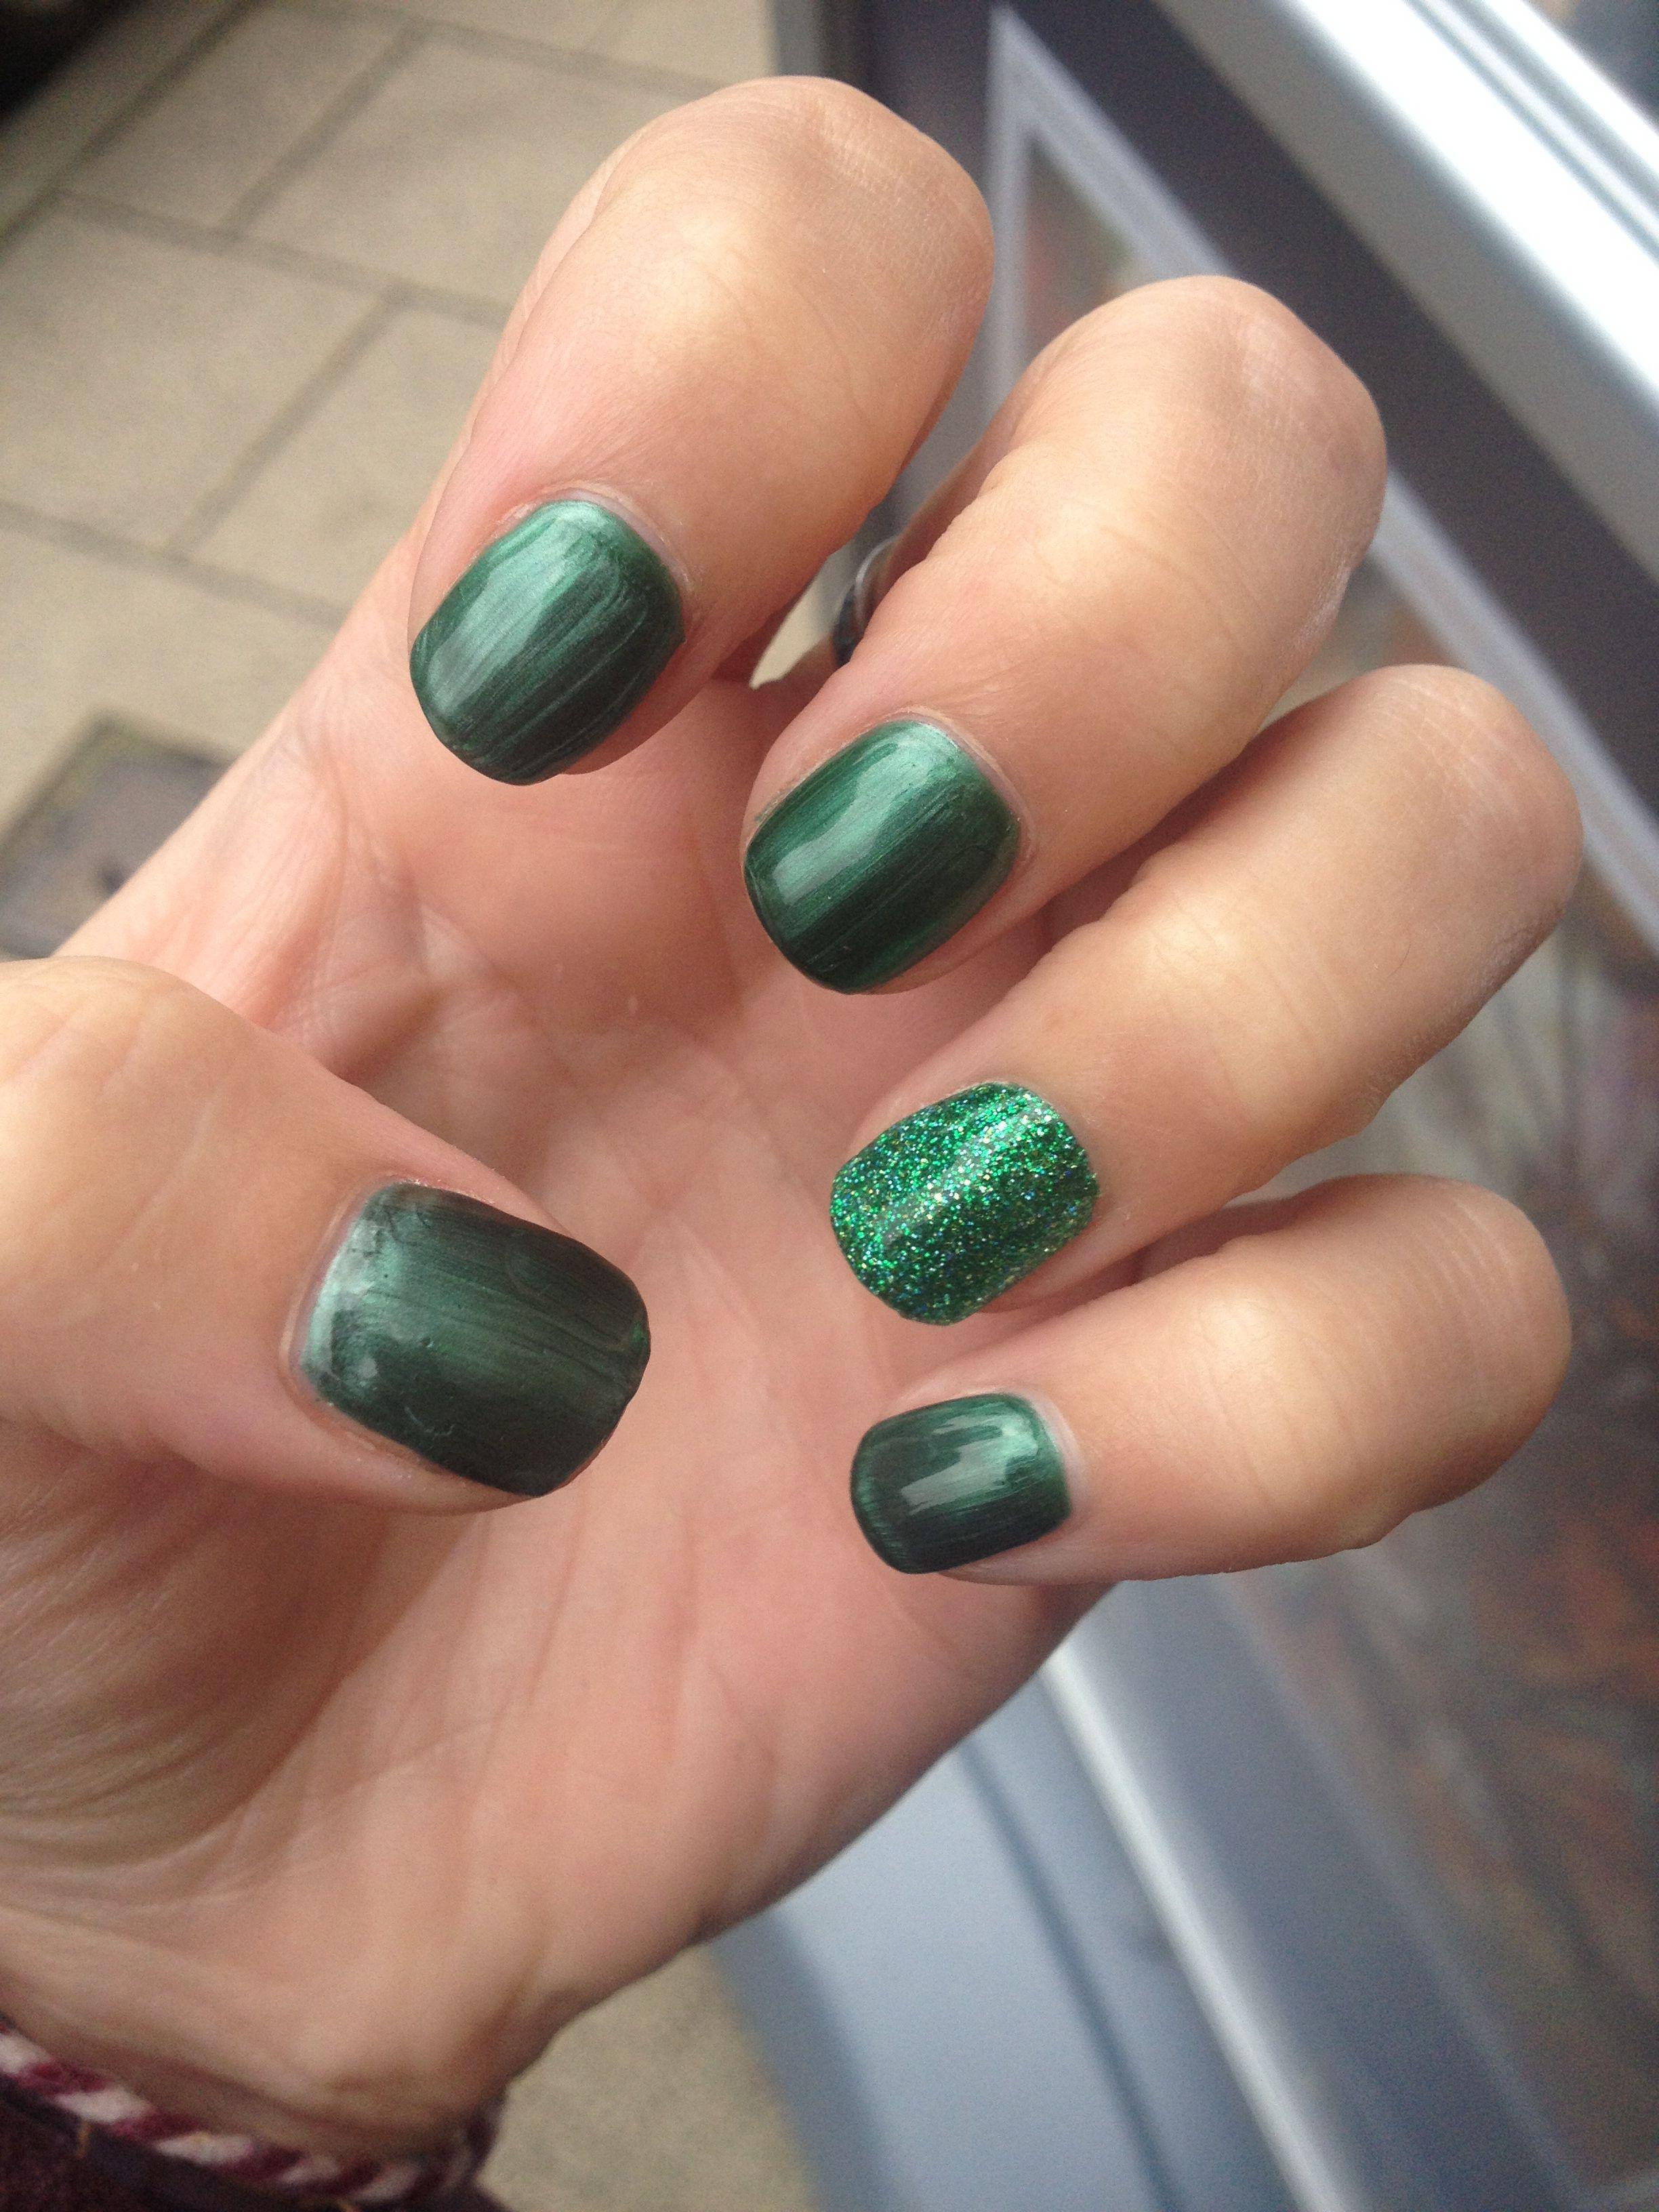 Green Glitter Gel Nails Glitter Gel Nails Red Nails Glitter Glitter Gel